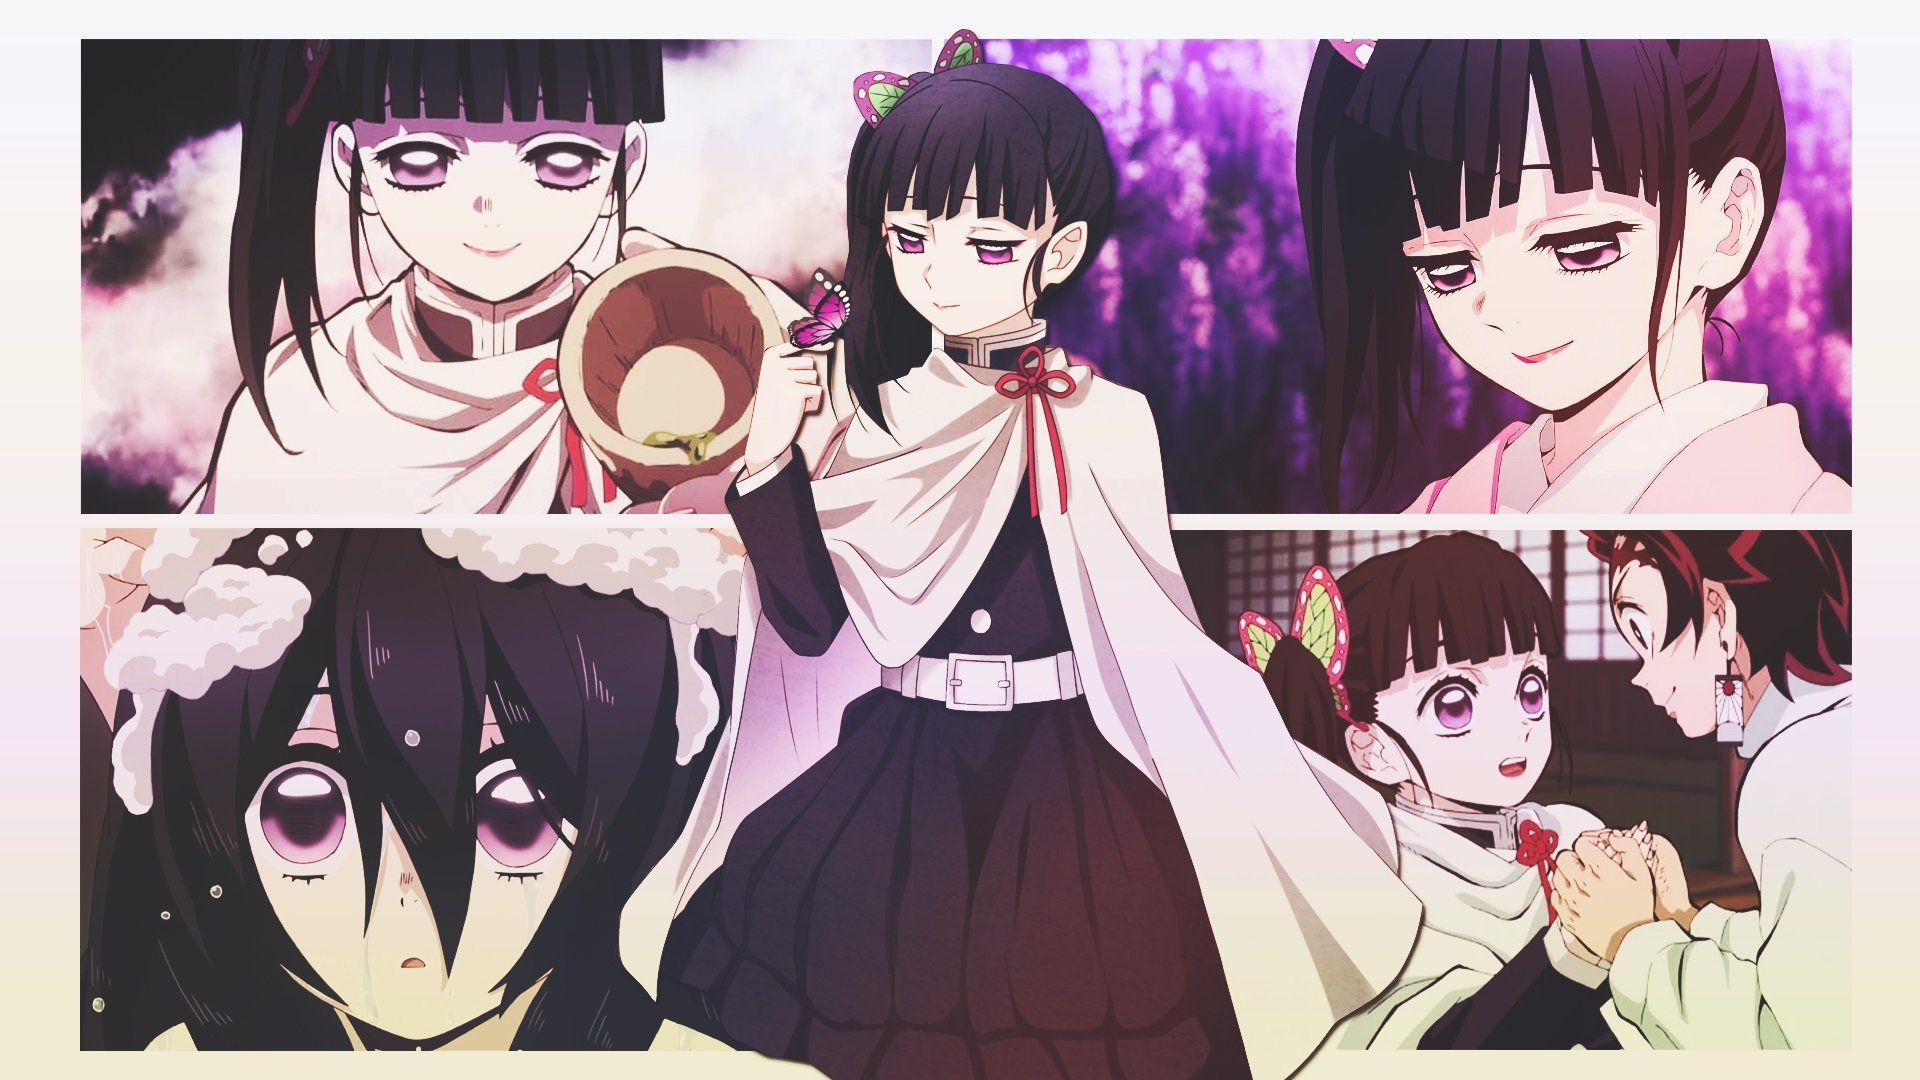 Demon Slayer Kimetsu No Yaiba Hd Wallpaper Background Image 1920x1080 Id 1044292 Wallpaper Abyss